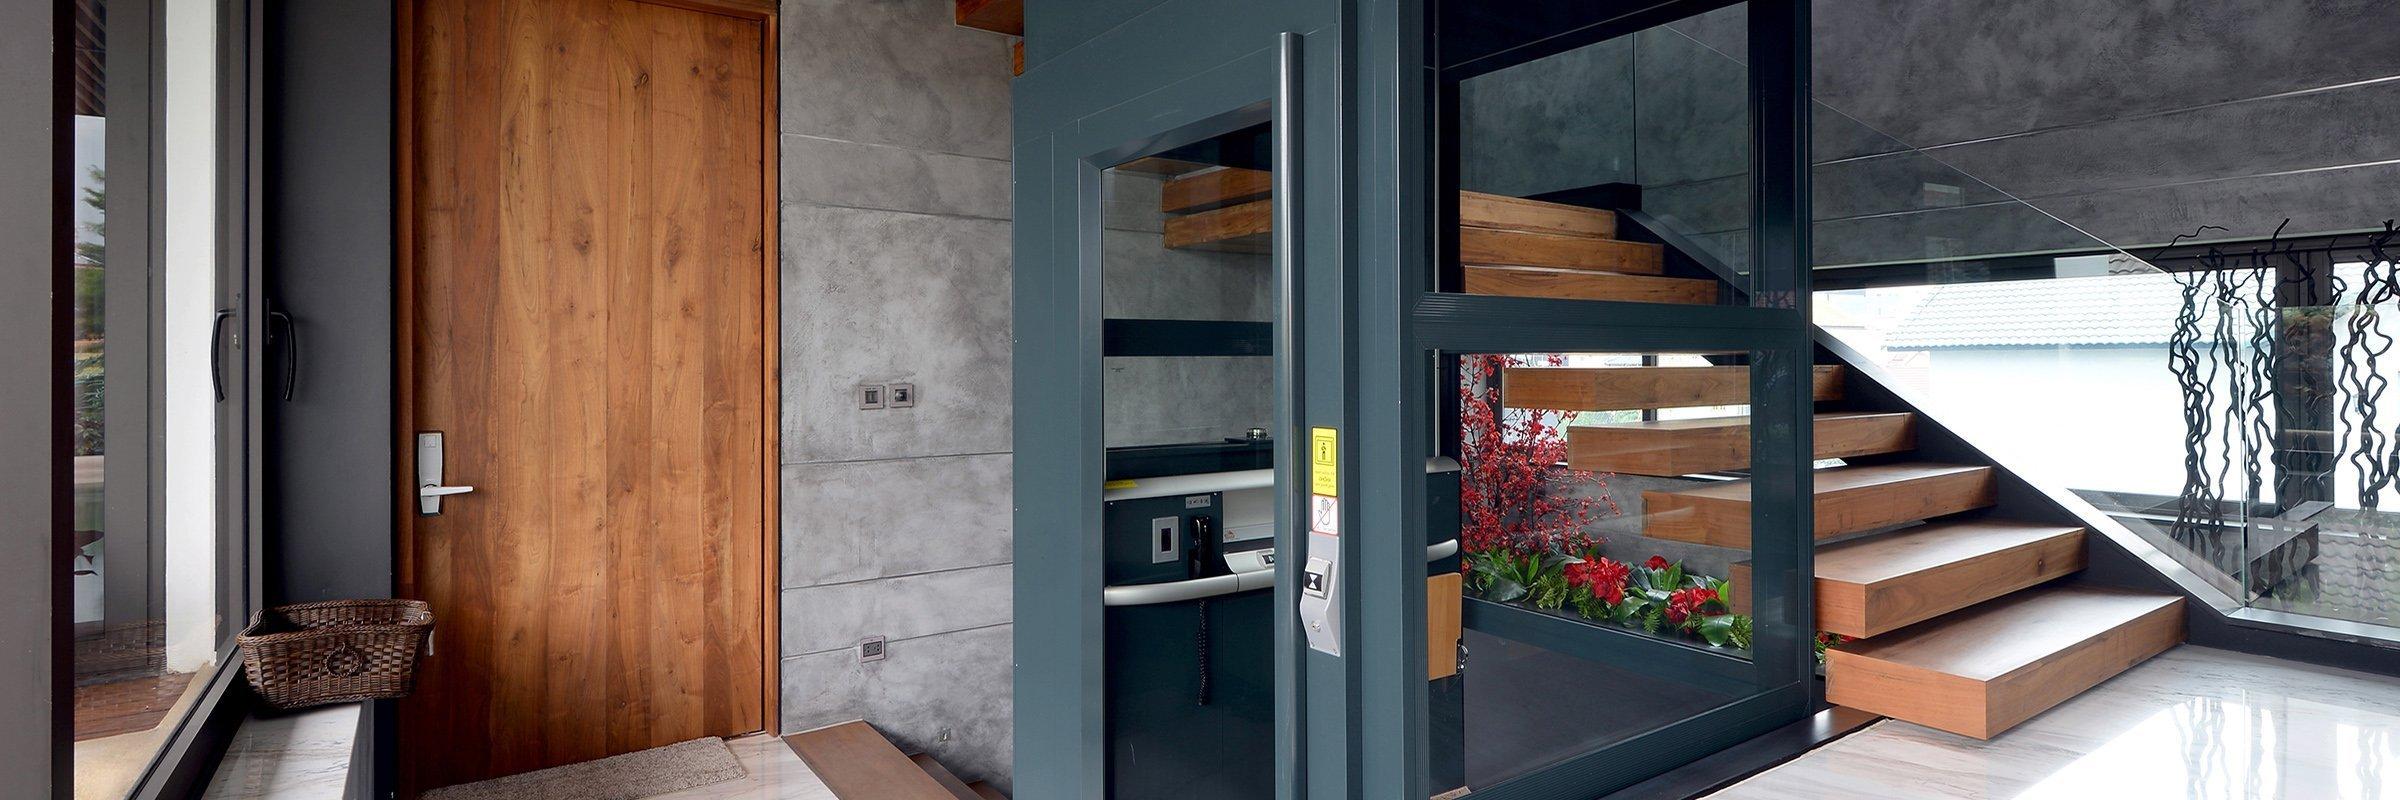 Home Lift Design